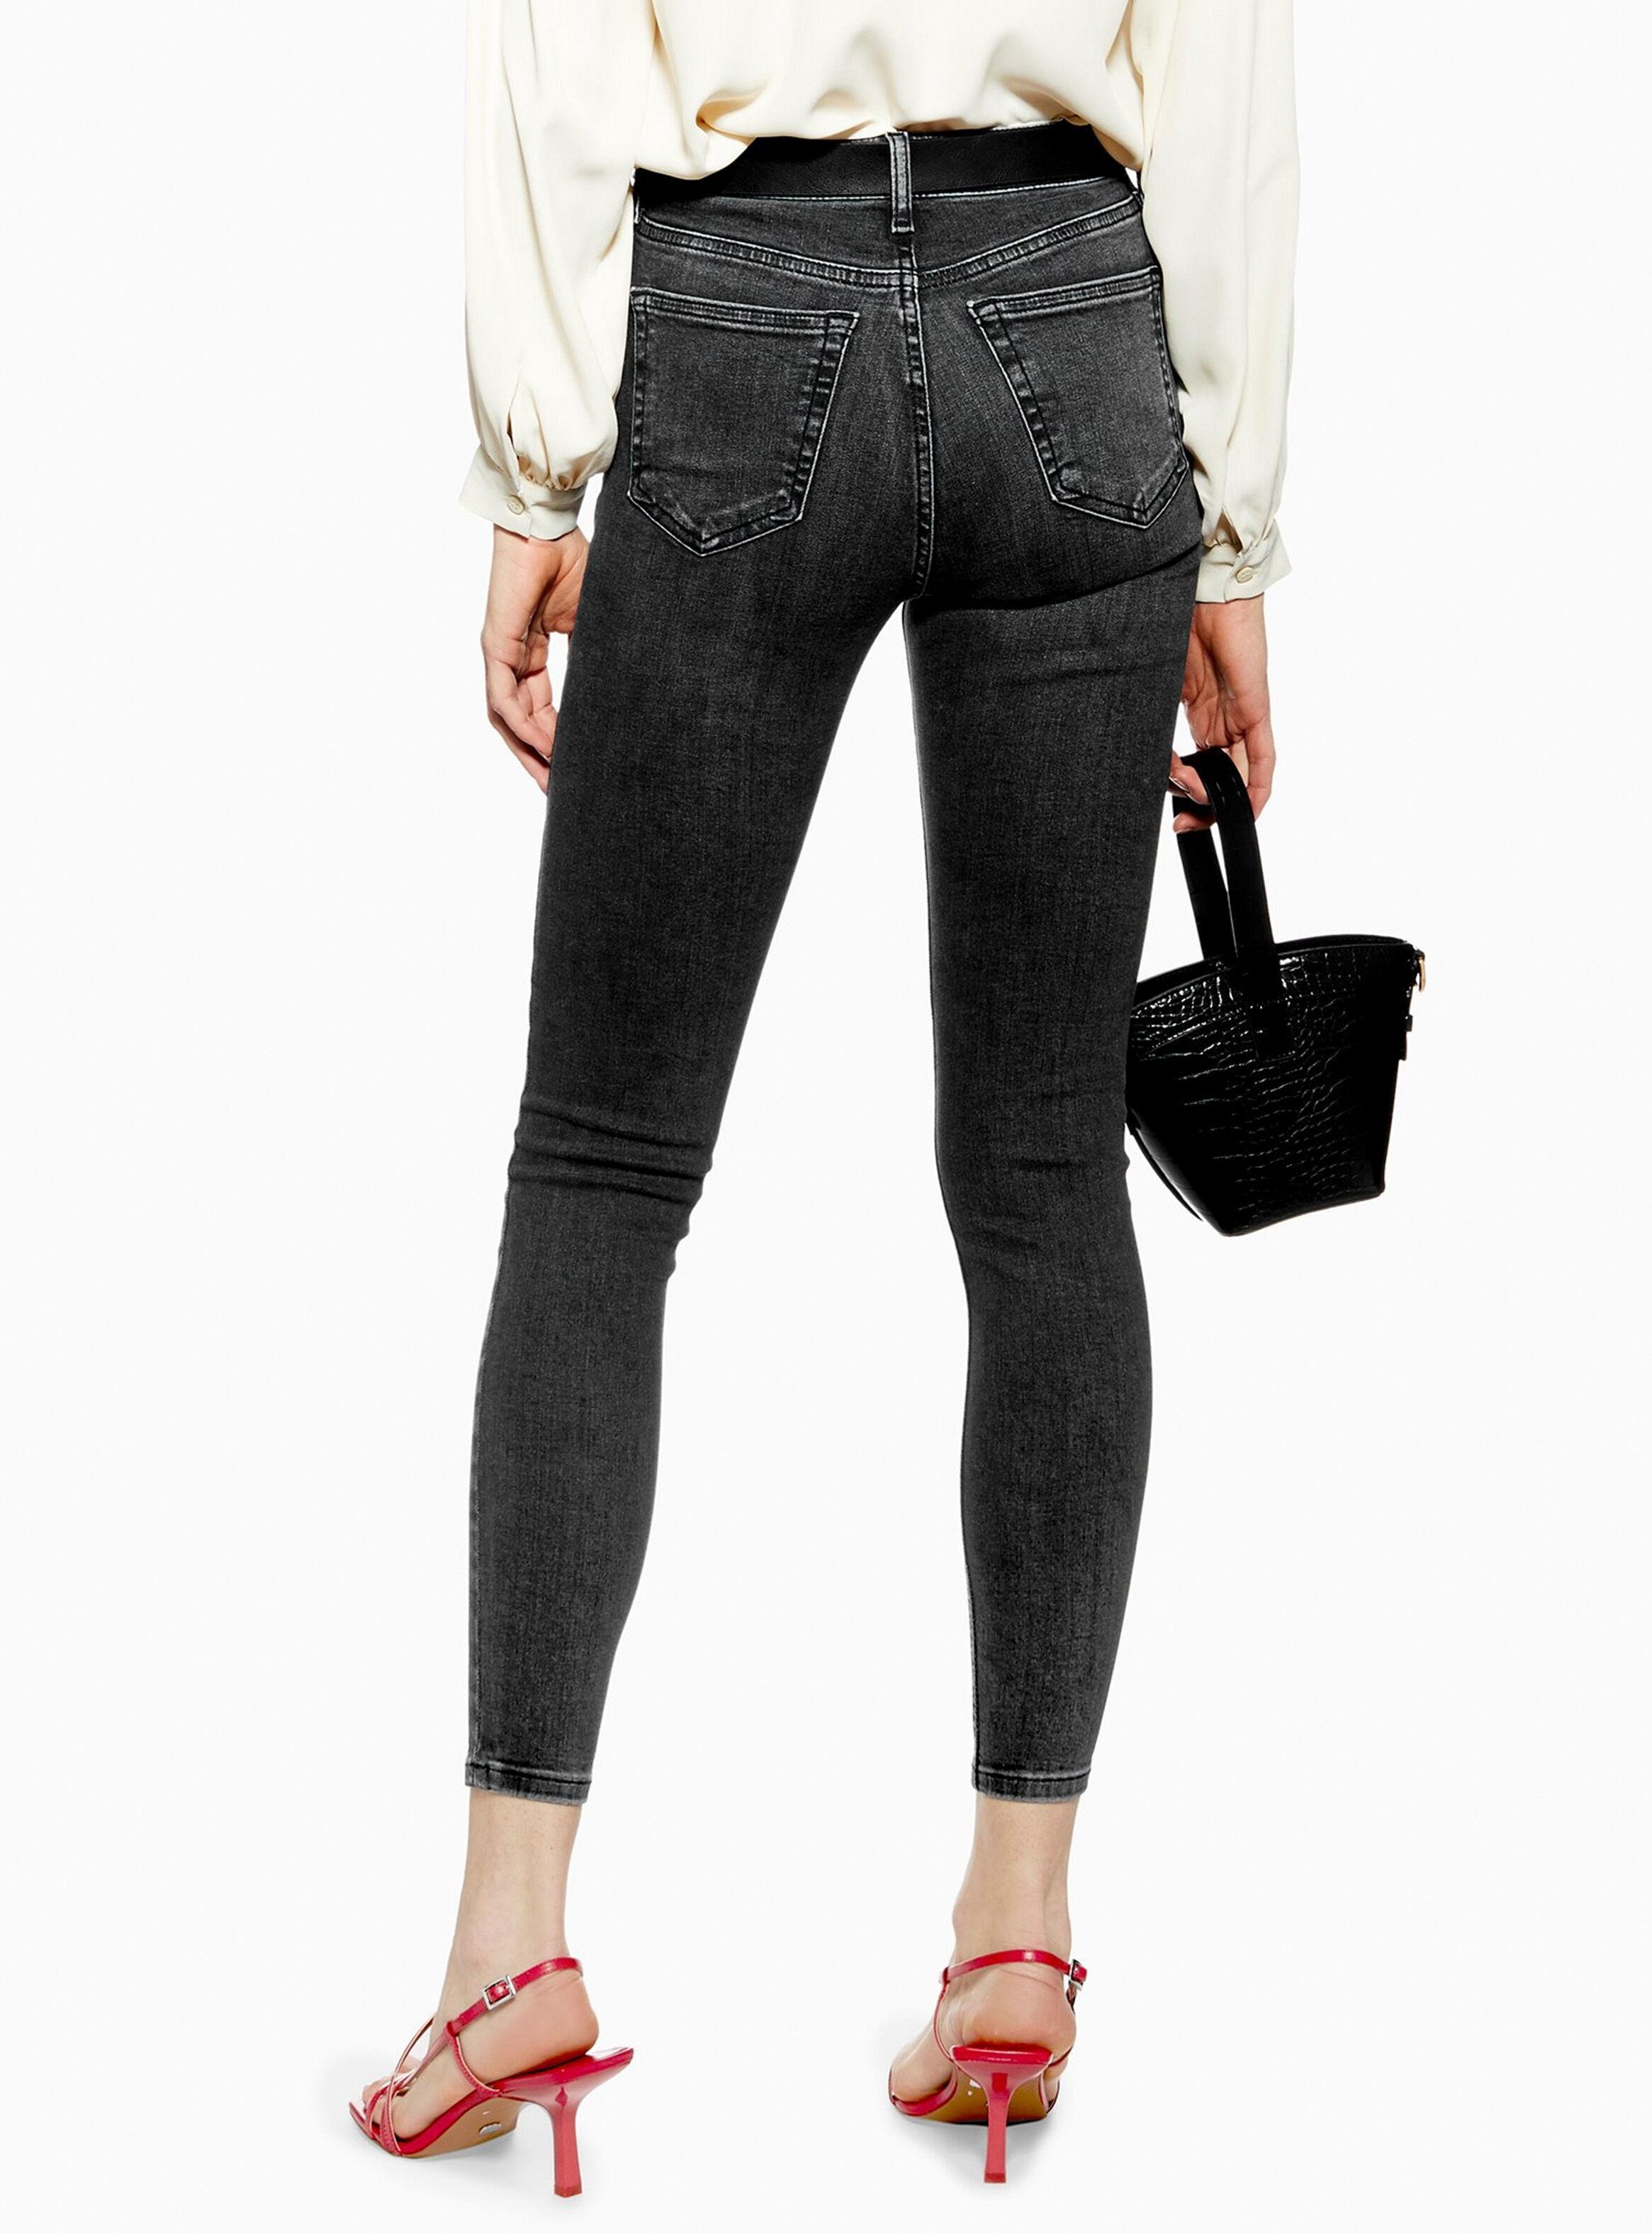 Jeans Jamie Washed Black Largo 32 Topshop